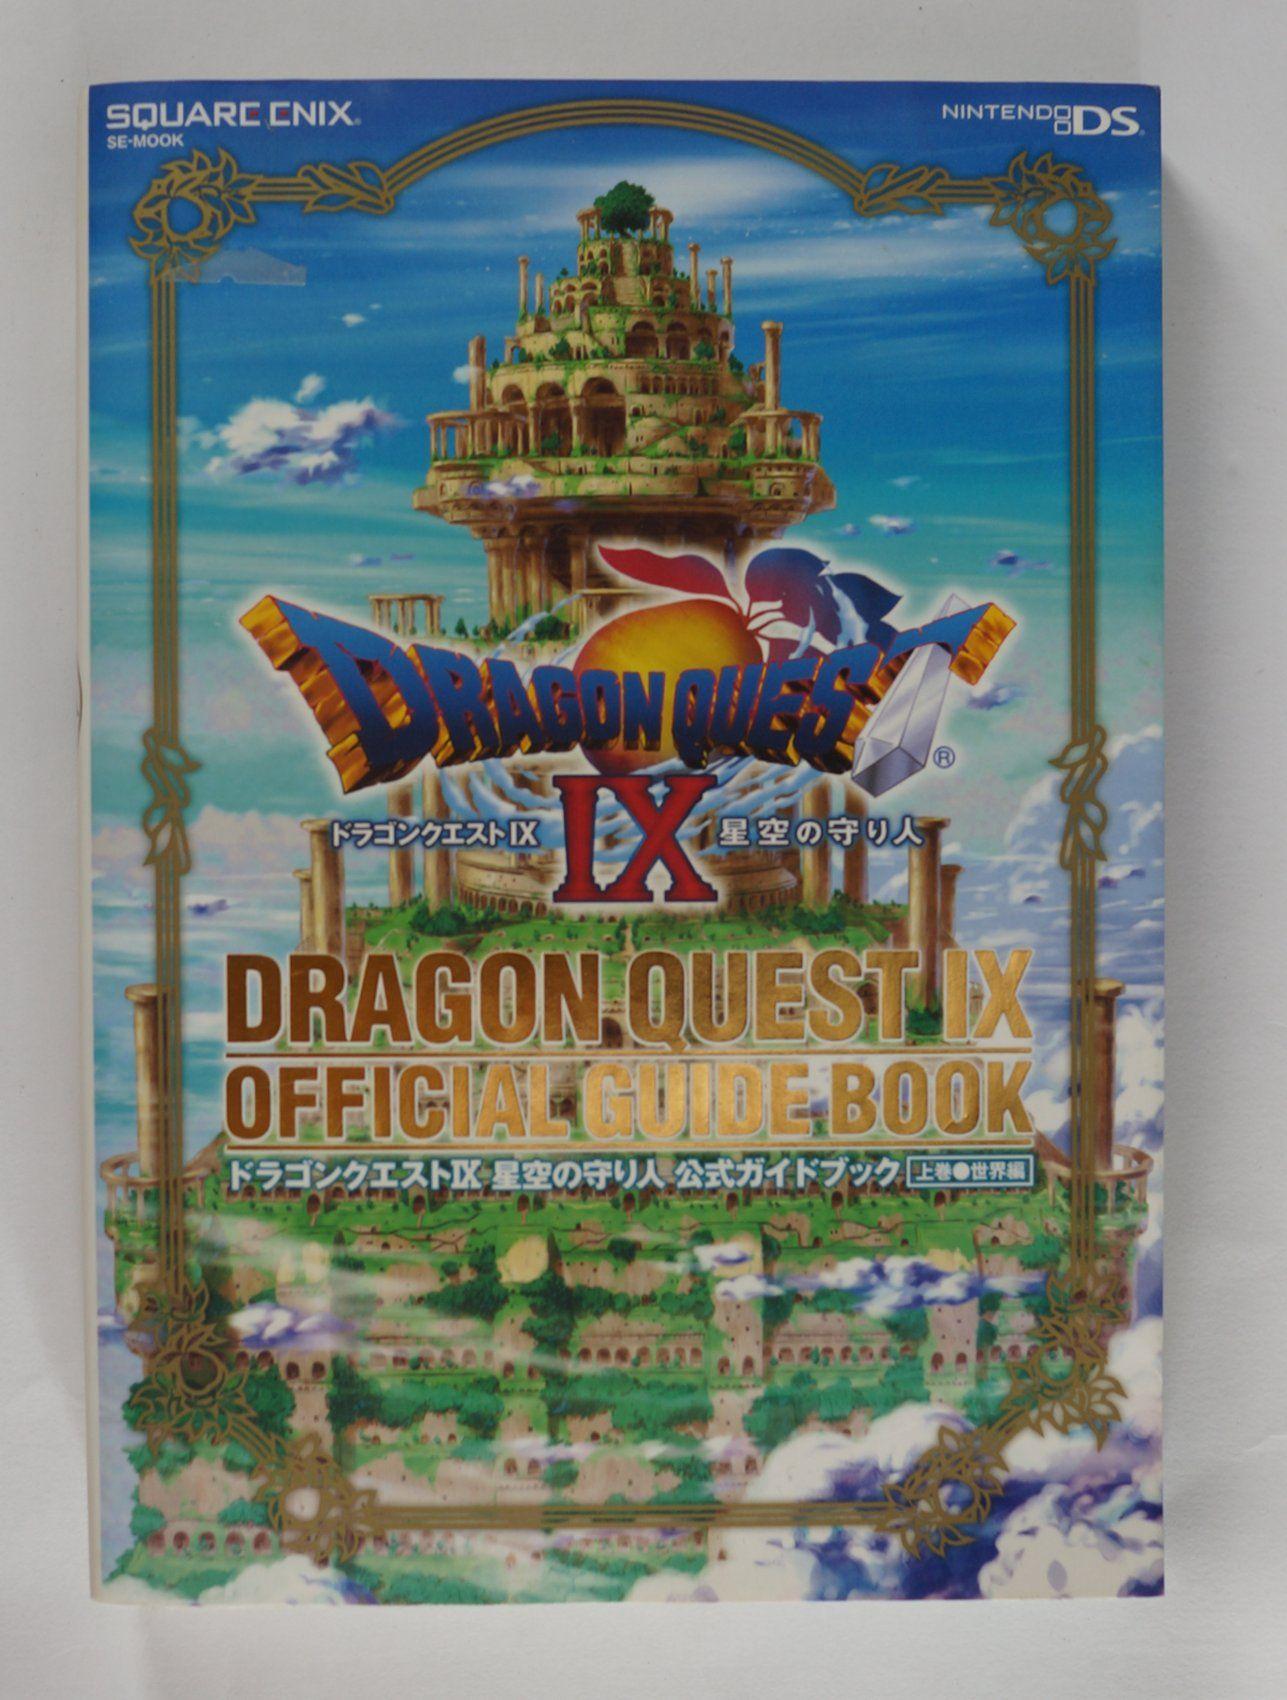 Dragonquest Dragon Quest Ix Nintendo Ds Official Guide